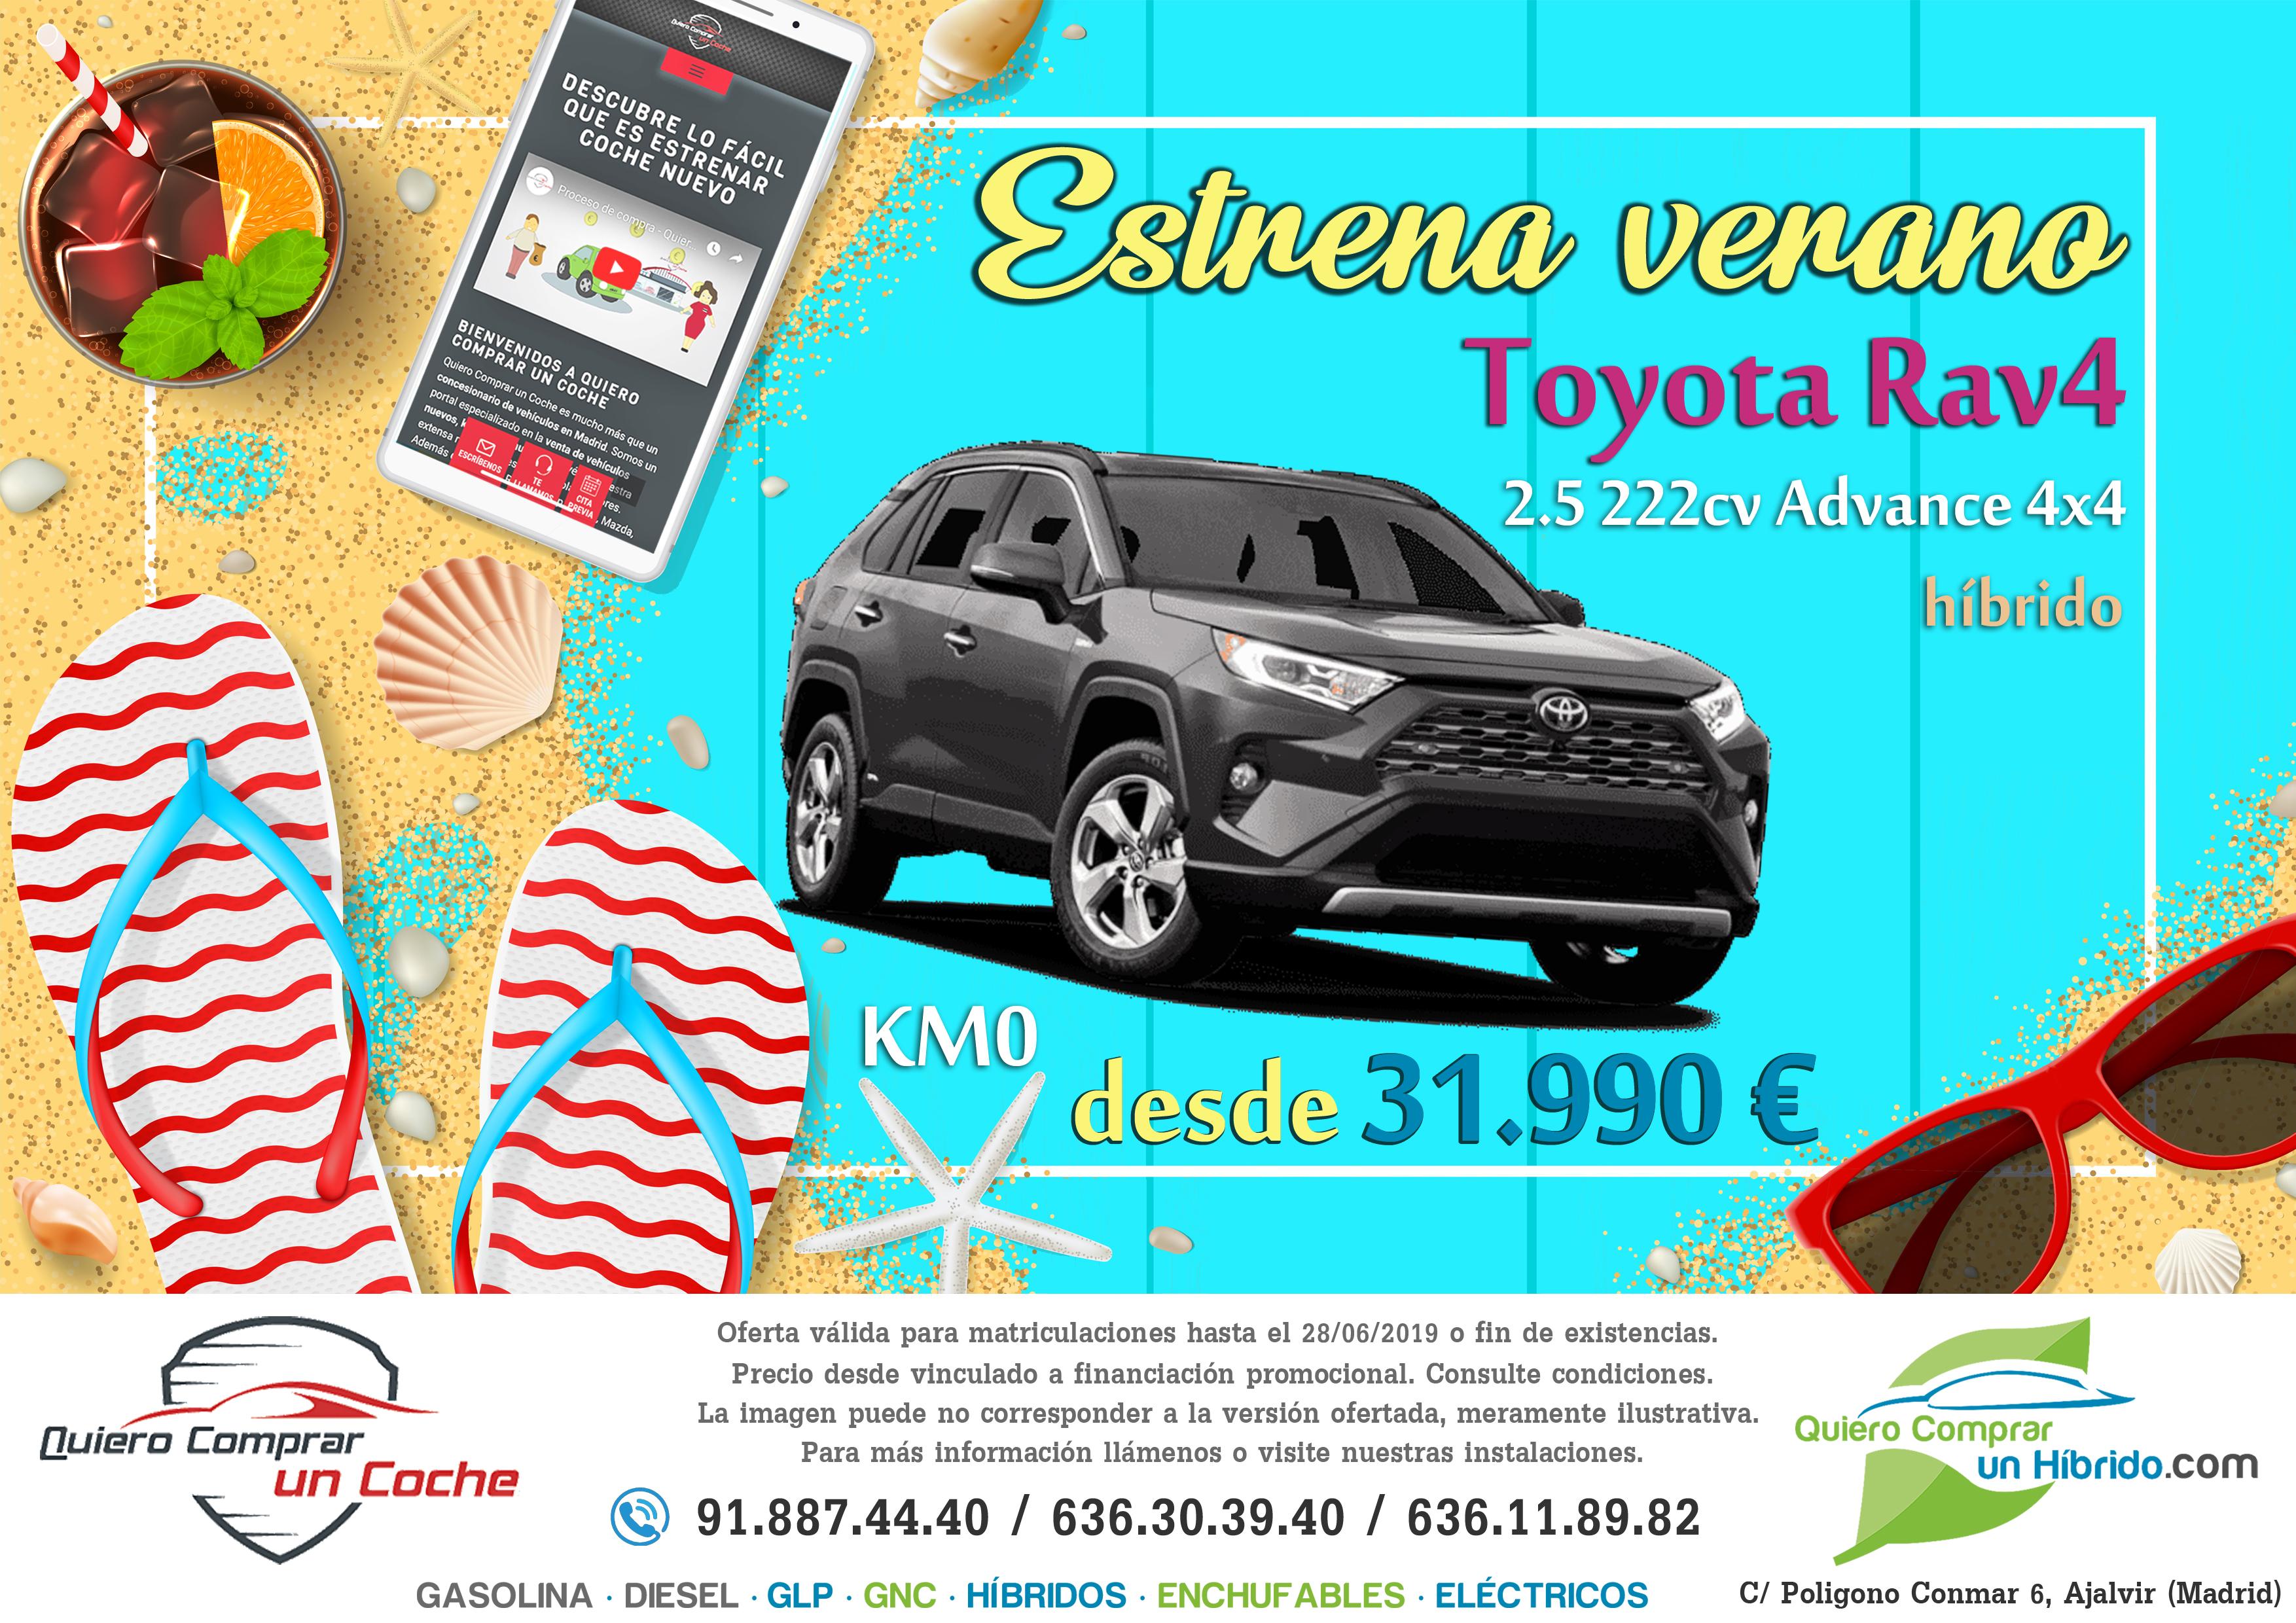 TOYOTA RAV4 2019 ADVANCE 4X4 OFERTA QUIERO COMPRAR UN COCHE MADRID AJALVIR